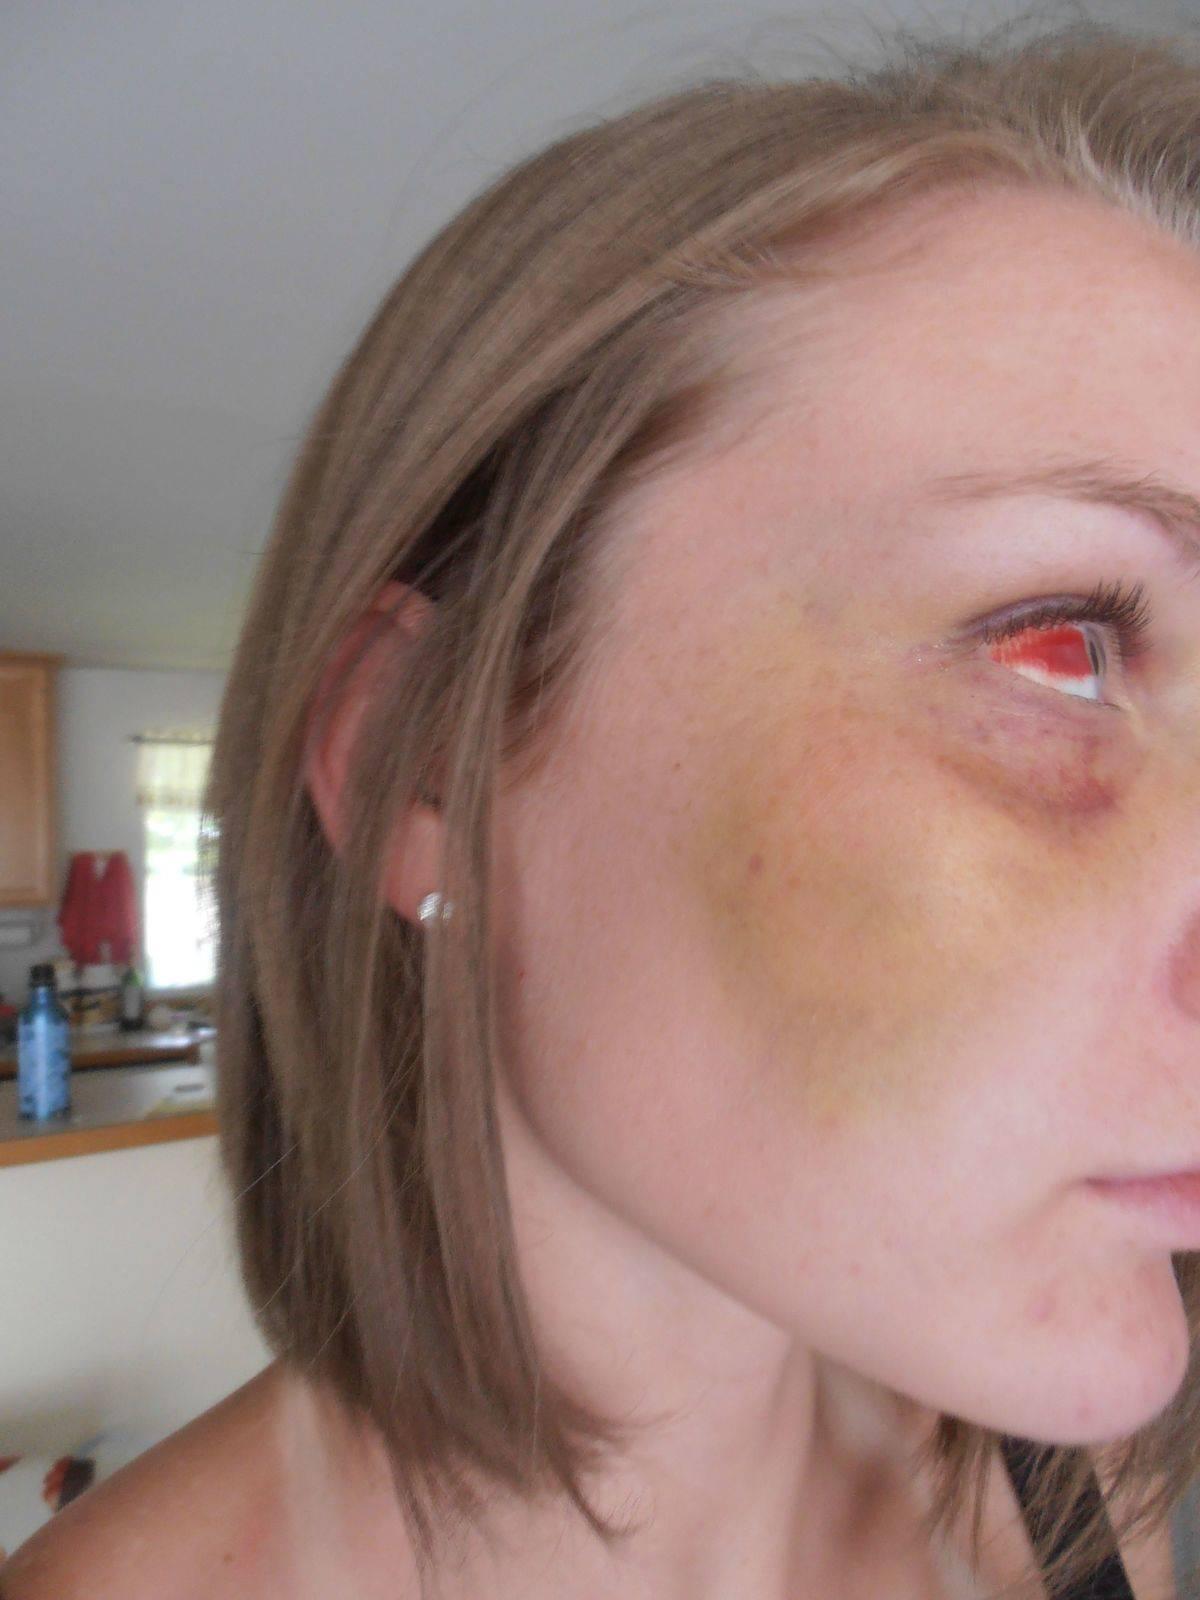 Woman with broken cheekbone and burst blood vessels